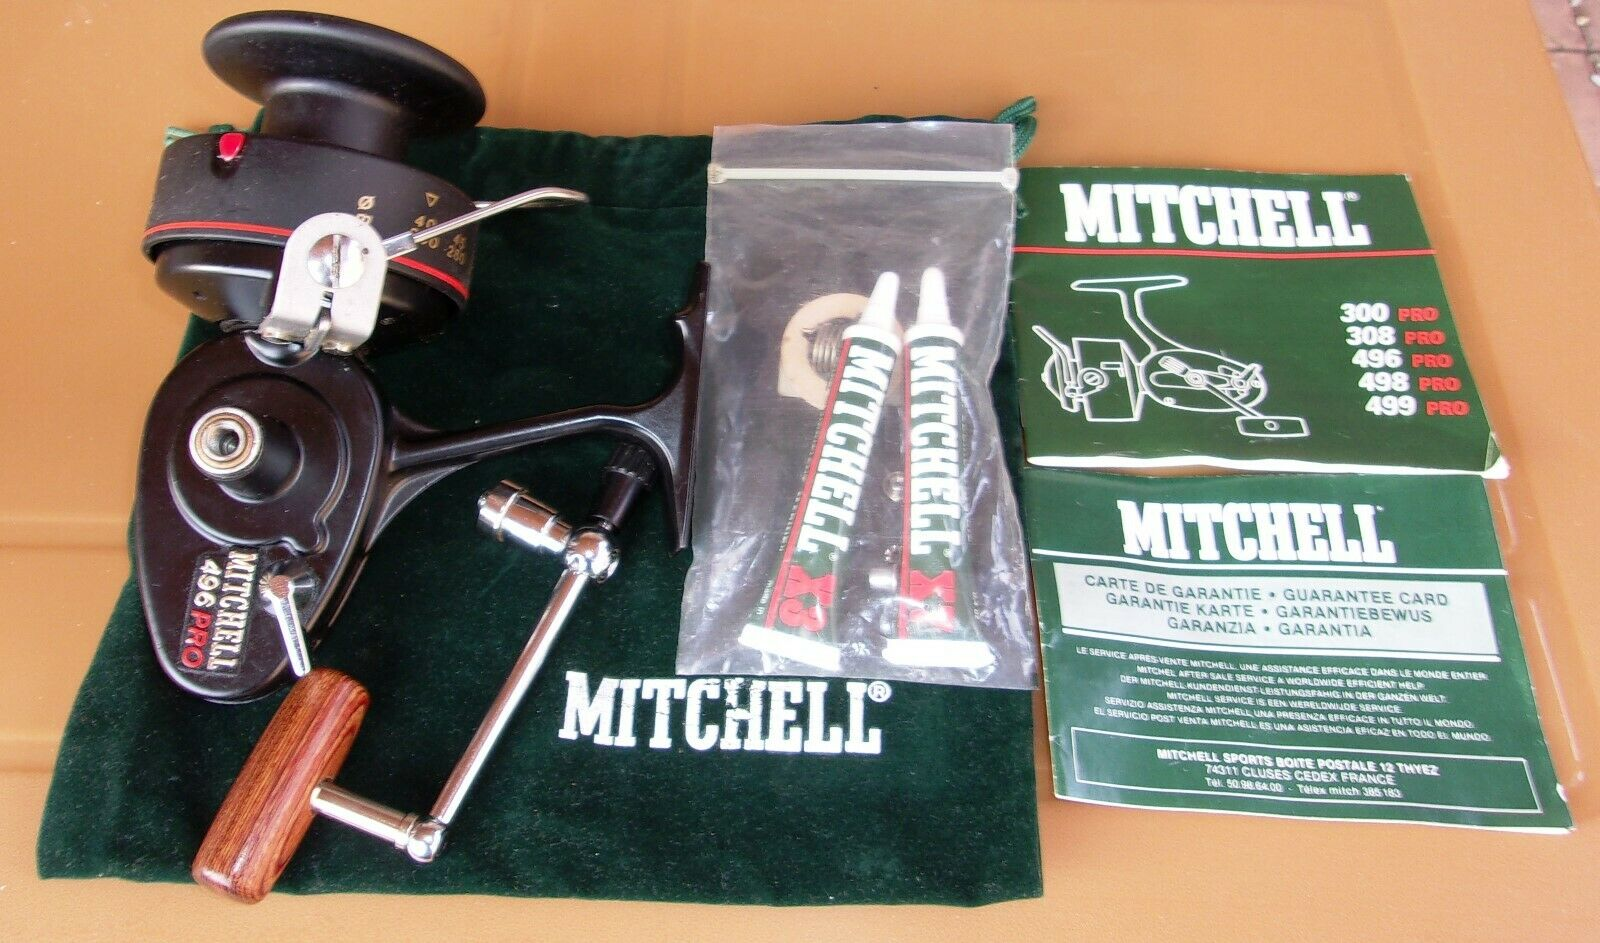 Mitchell 496 Pro en Caja Nuevo